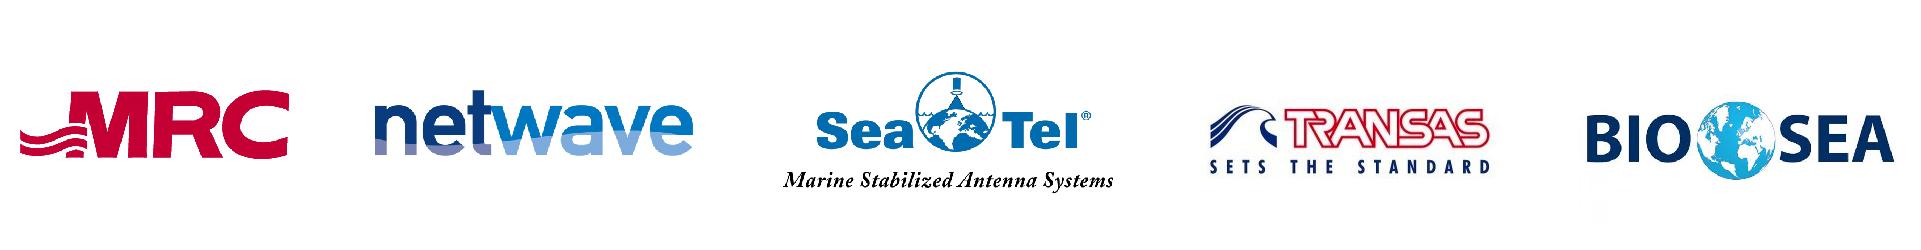 mrc netwave seatel transas biosea